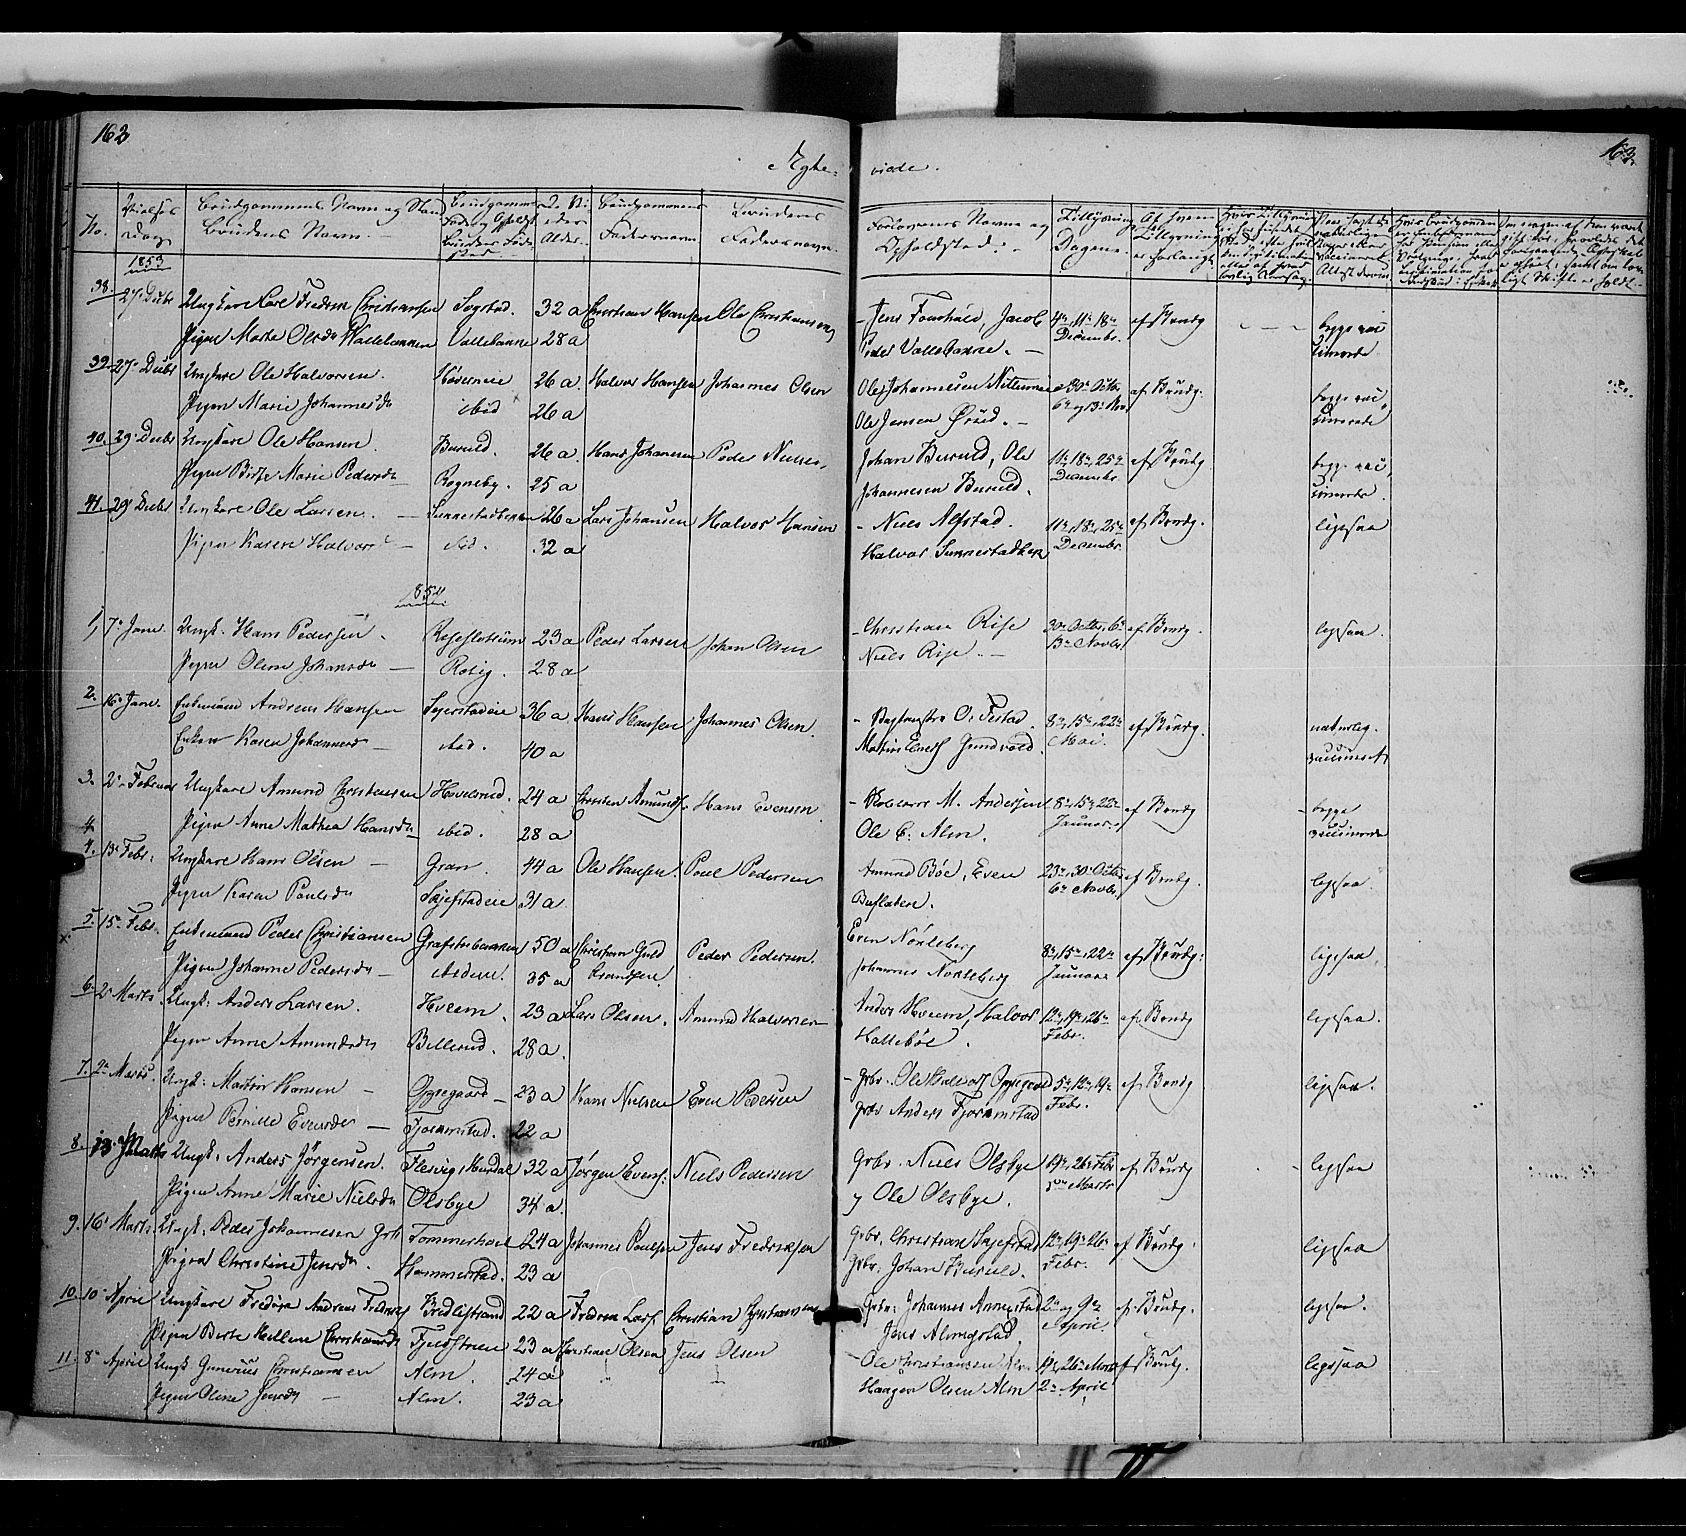 SAH, Østre Toten prestekontor, Ministerialbok nr. 3, 1848-1856, s. 163